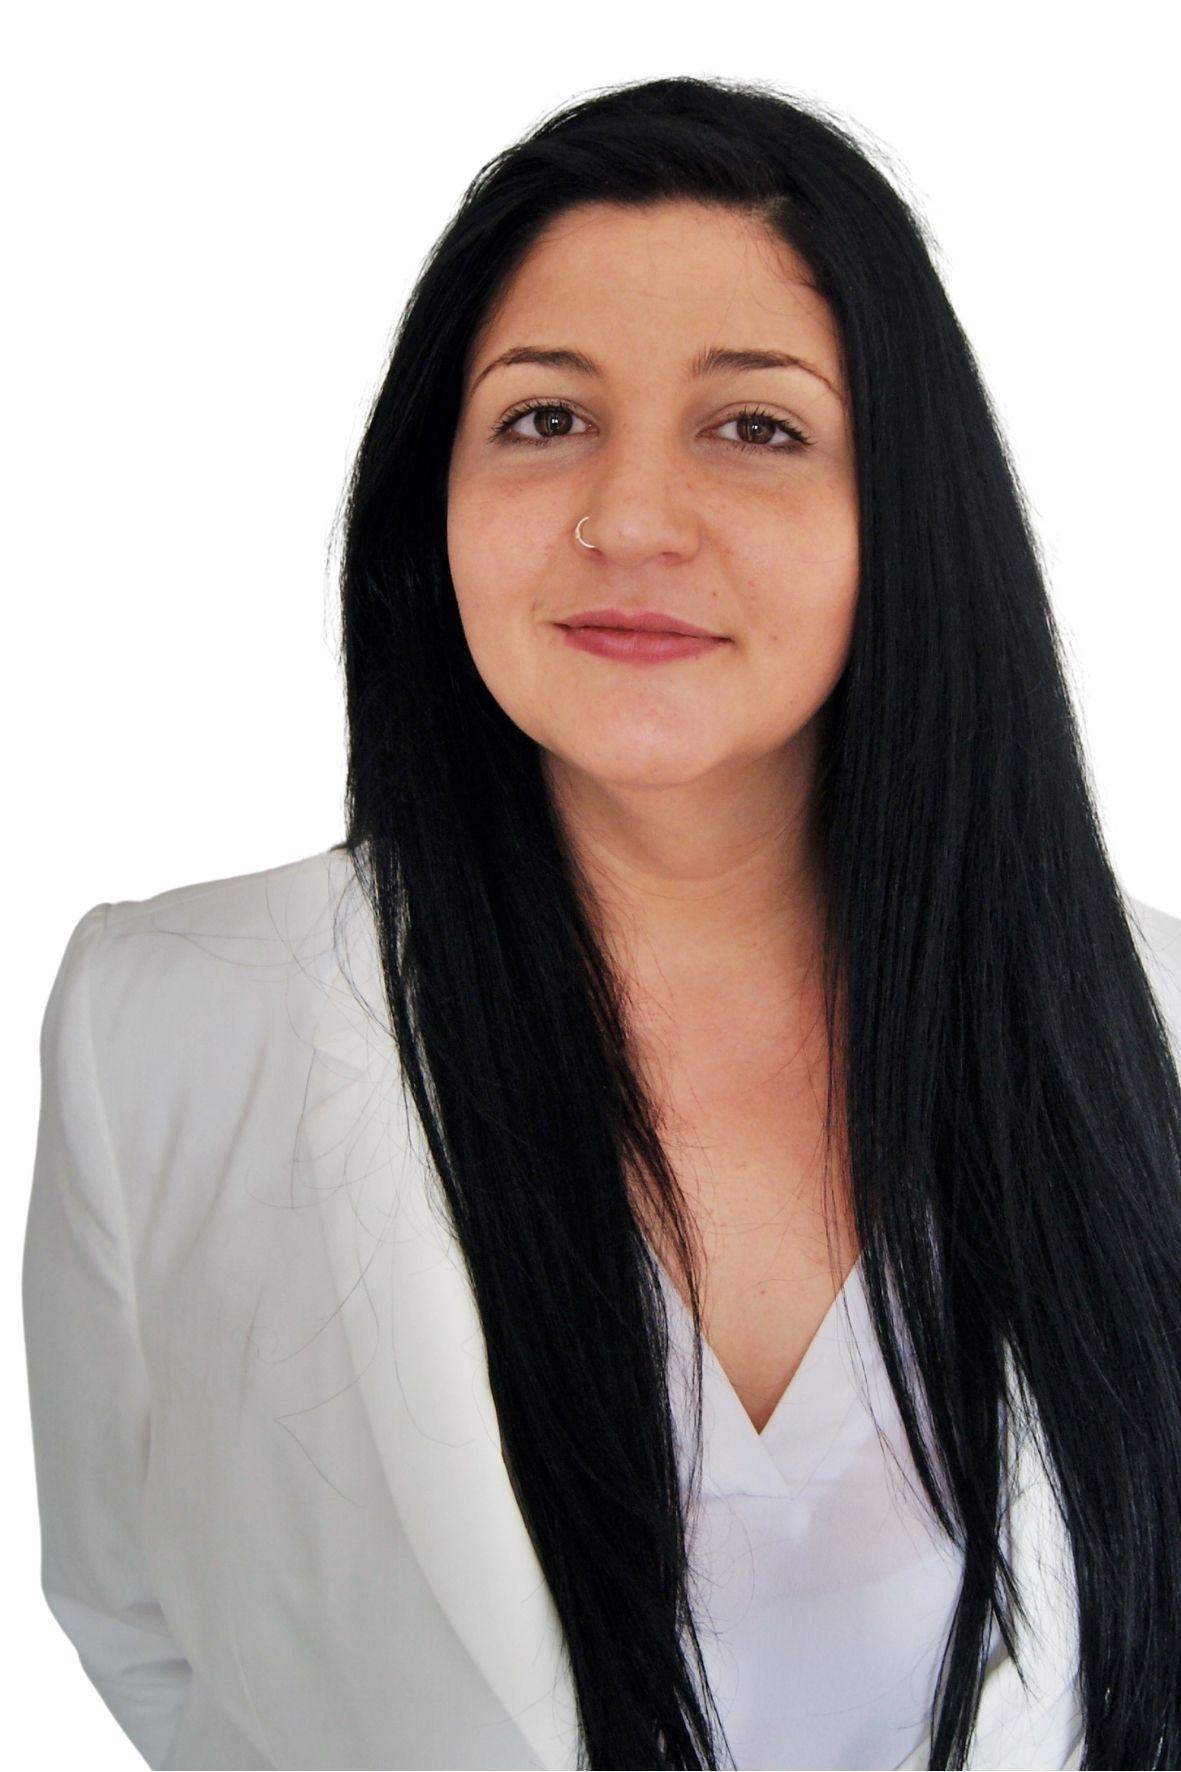 Estefania Palomino